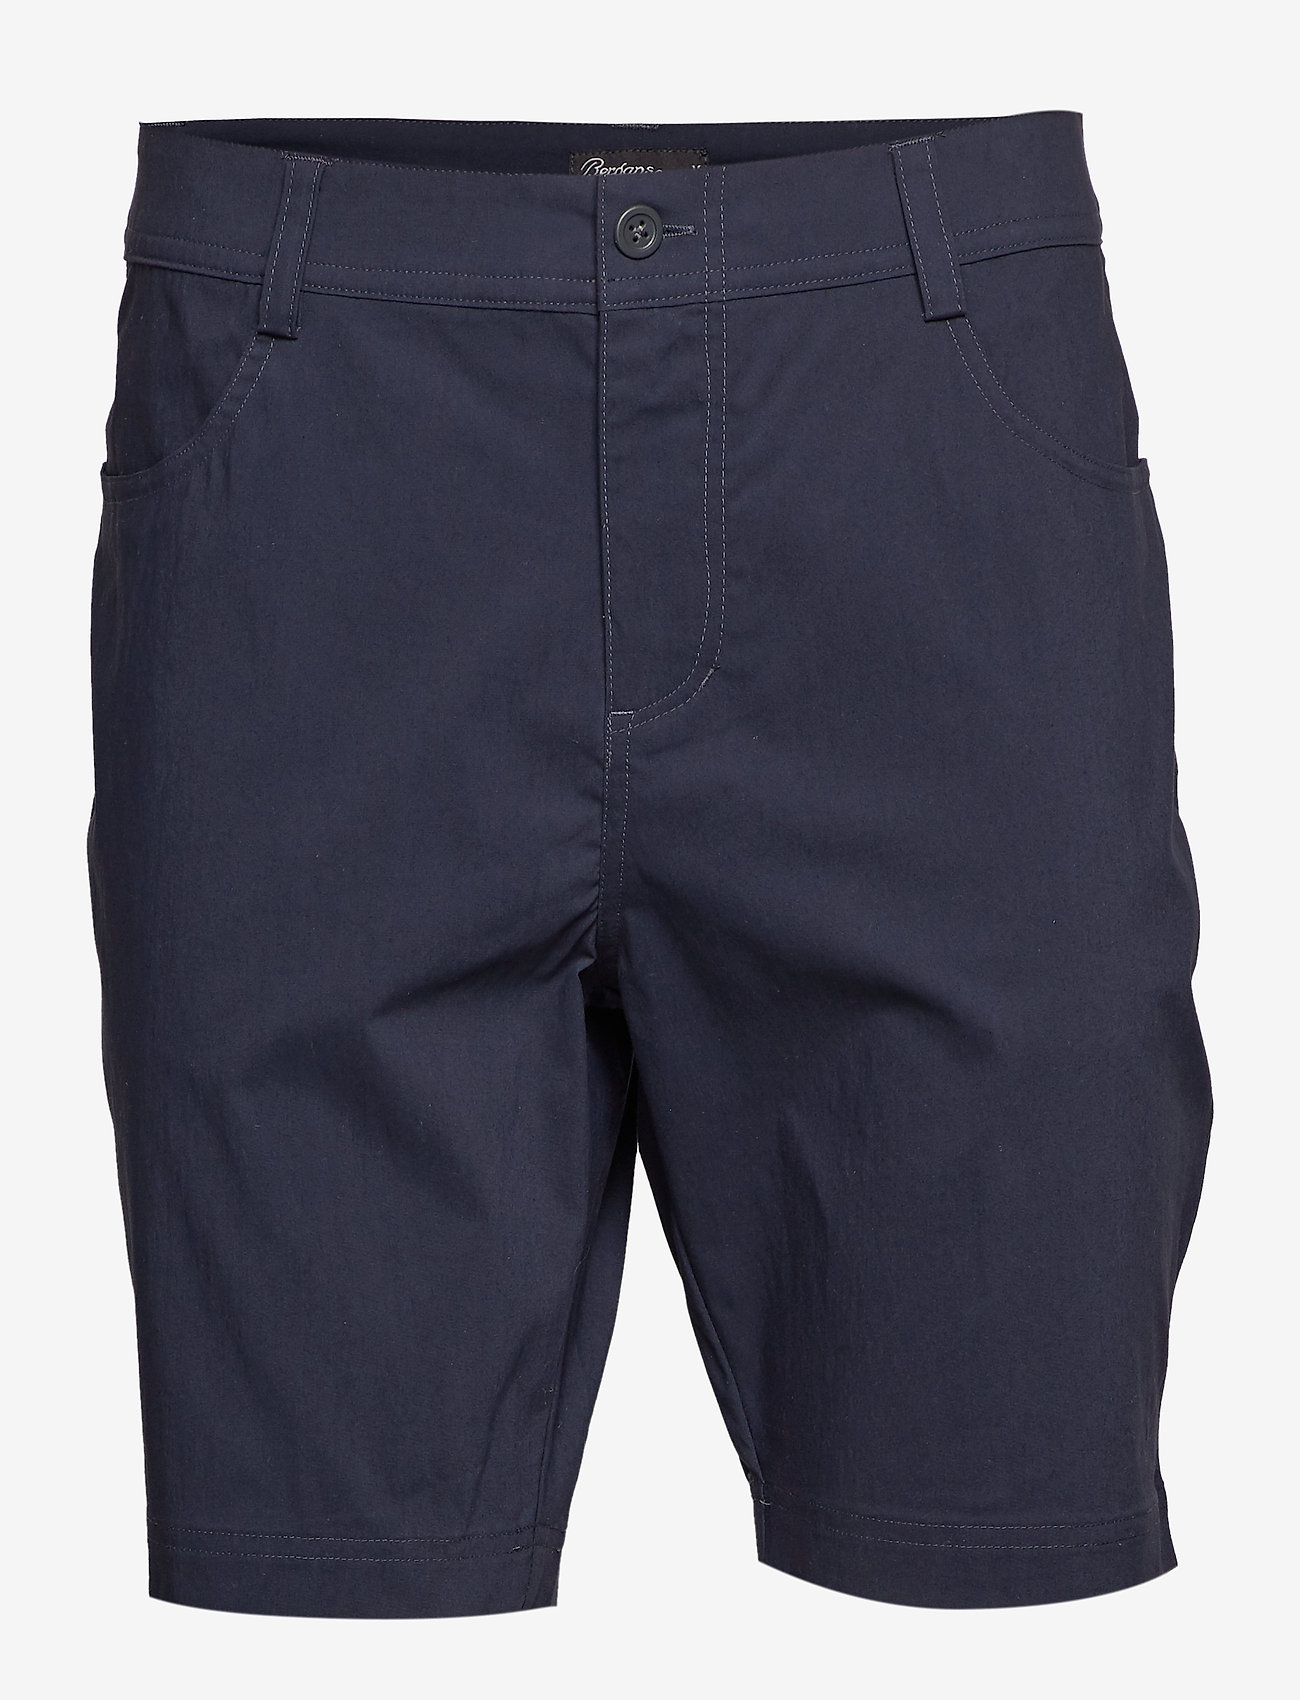 Bergans - Oslo Shorts - wandel korte broek - dark navy - 0